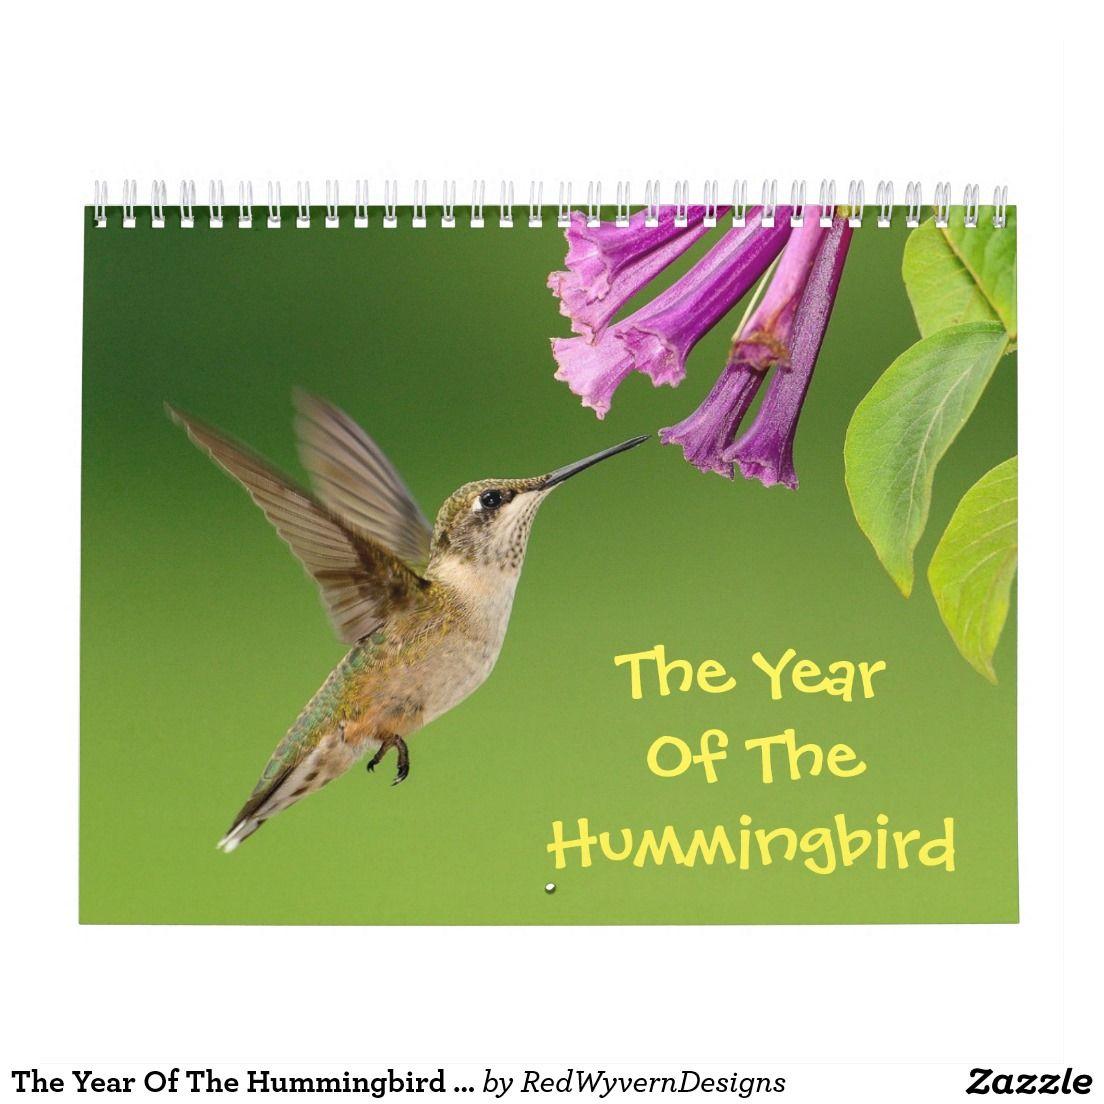 The Year Of The Hummingbird Calendar